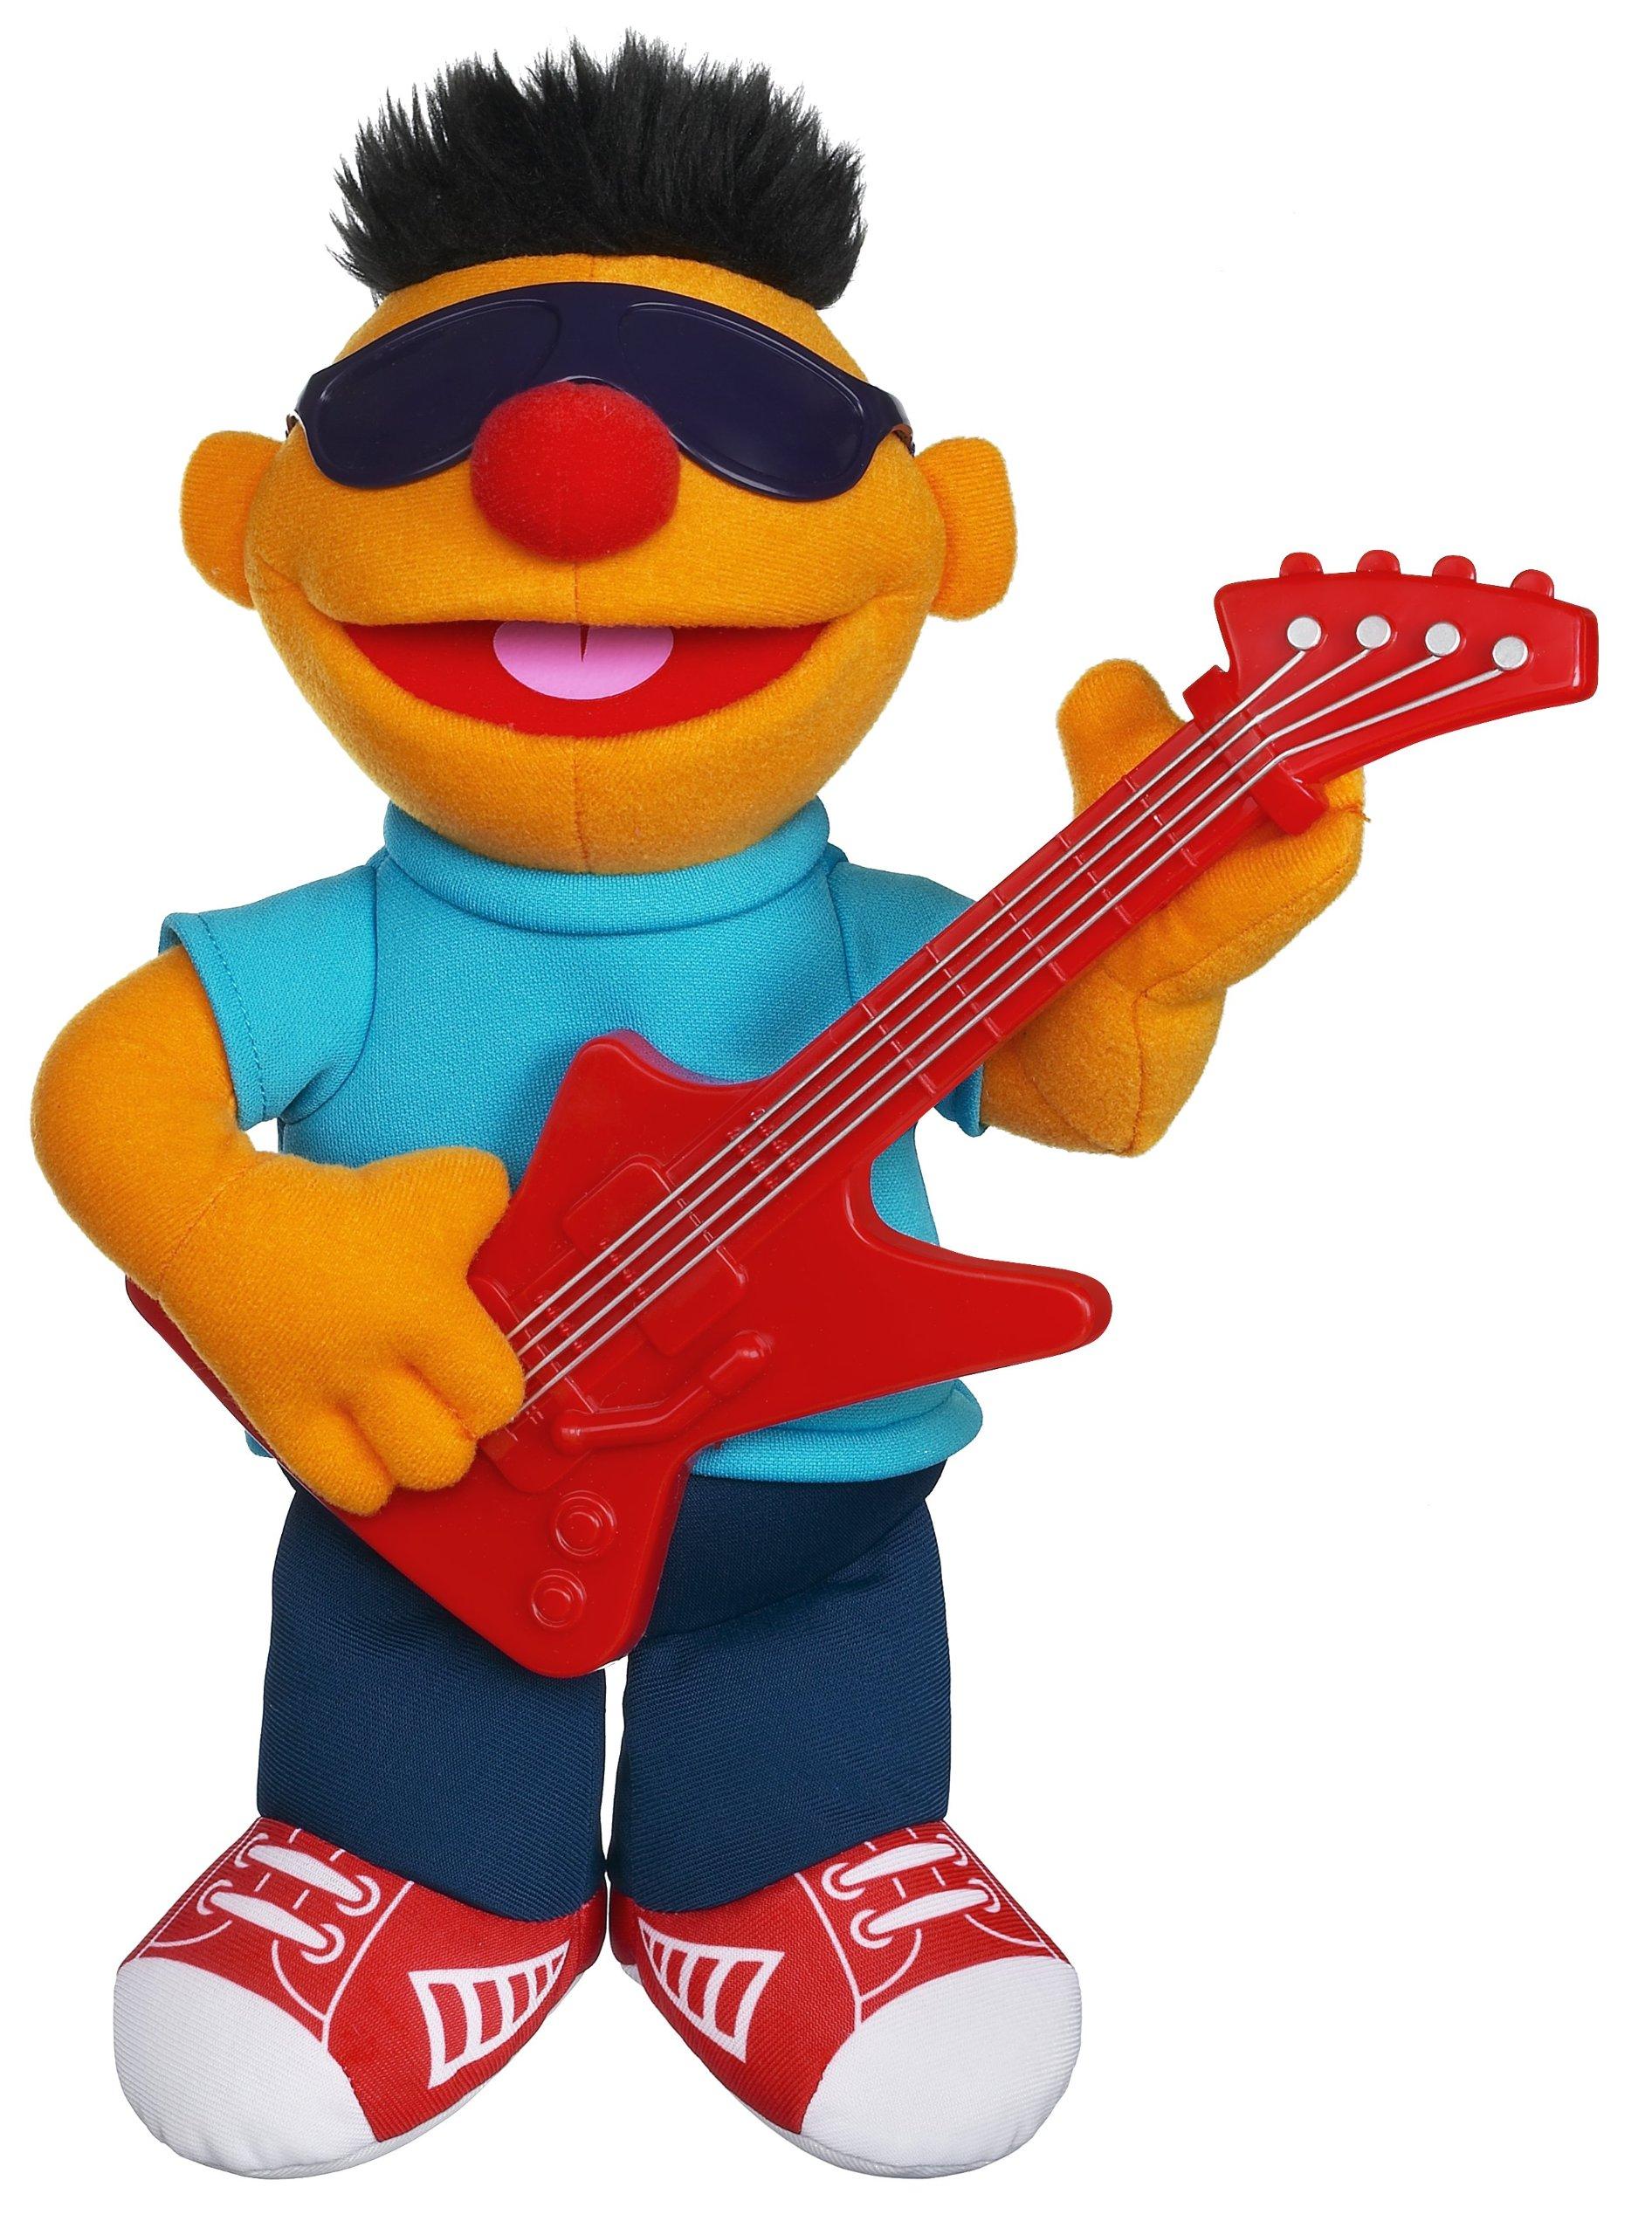 Barrio Sésamo Playskool Peluche de Epi (Toca la Guitarra): Amazon ...